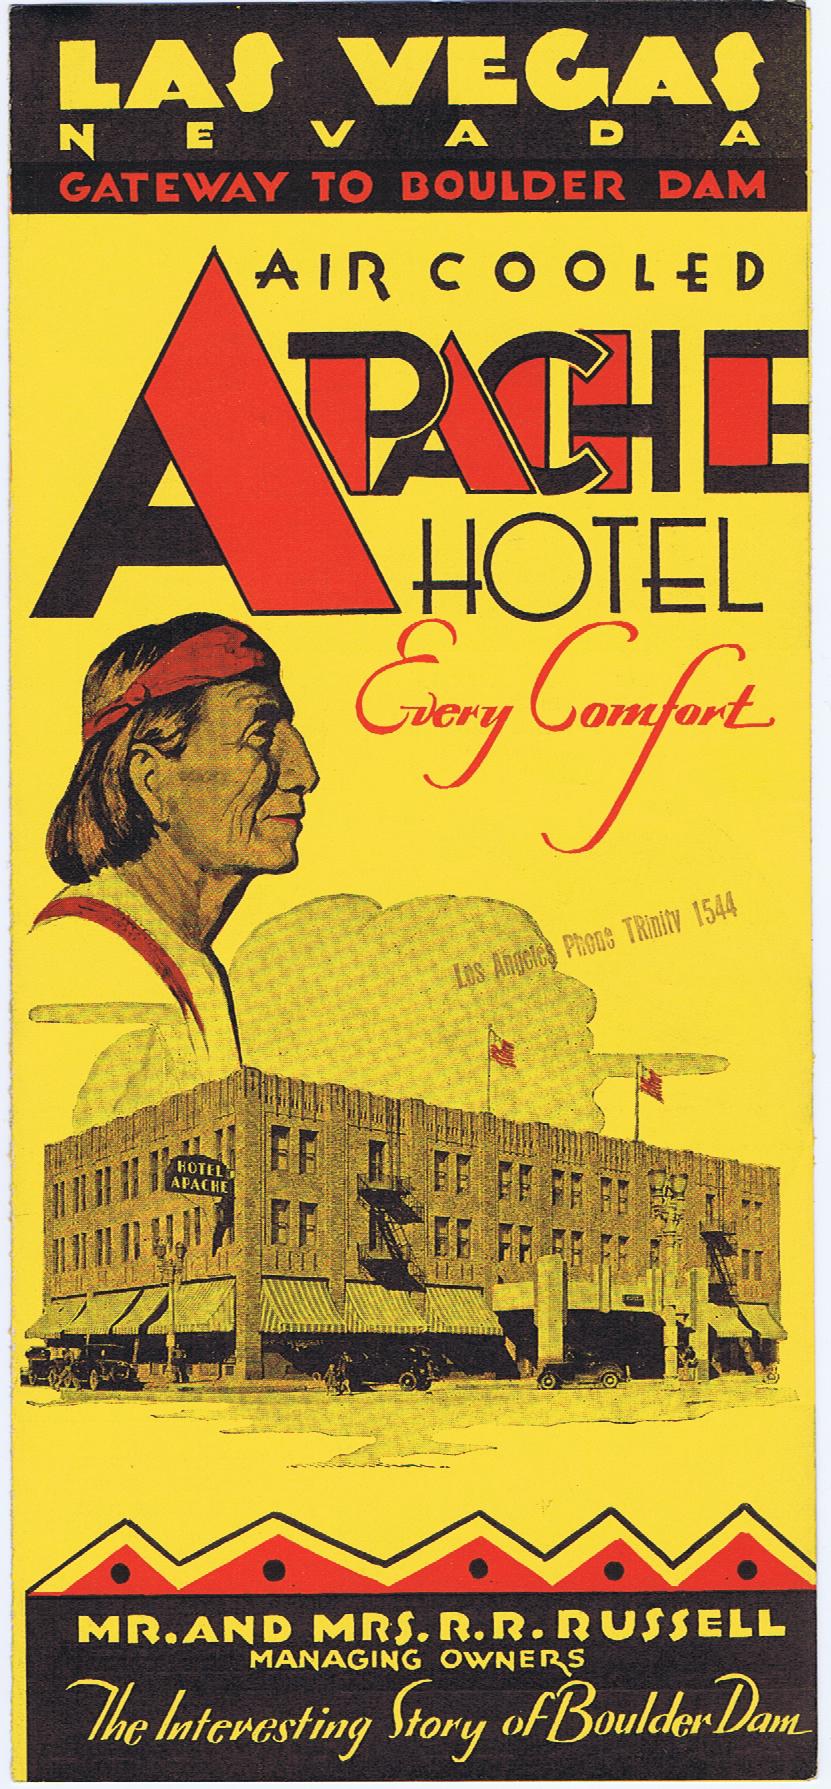 J698LAS VEGAS, NEVADA - APACHE HOTEL